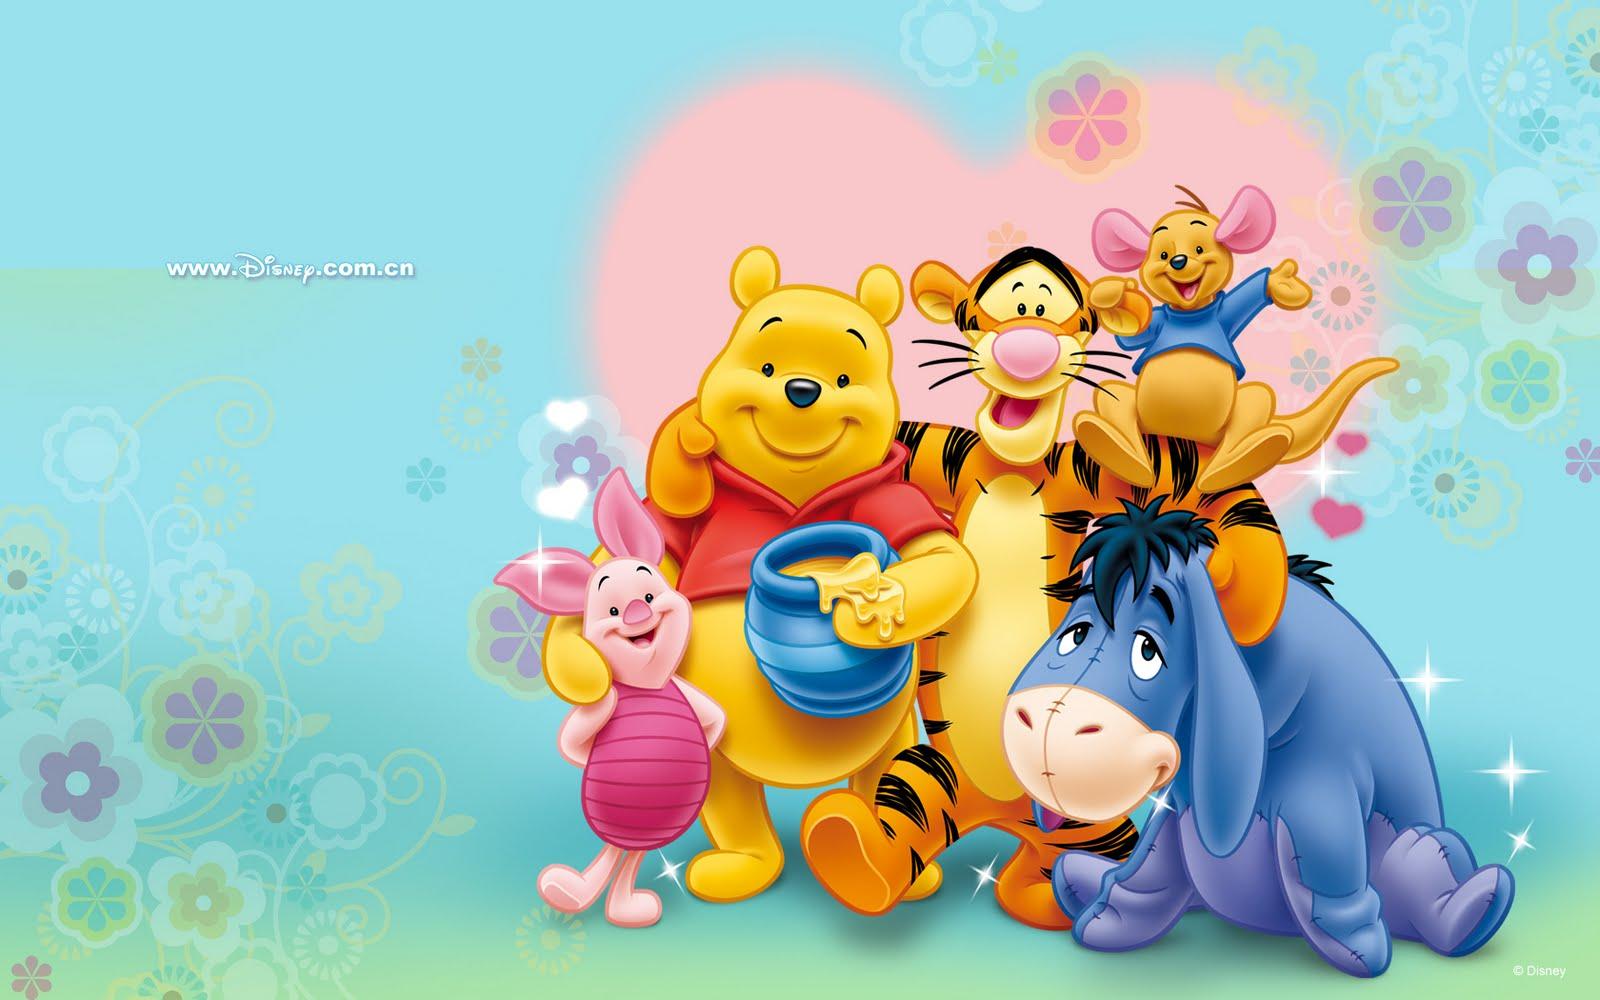 Idool Wallpapers De Winnie Pooh By Disney I 8 Imágenes Wallpaper